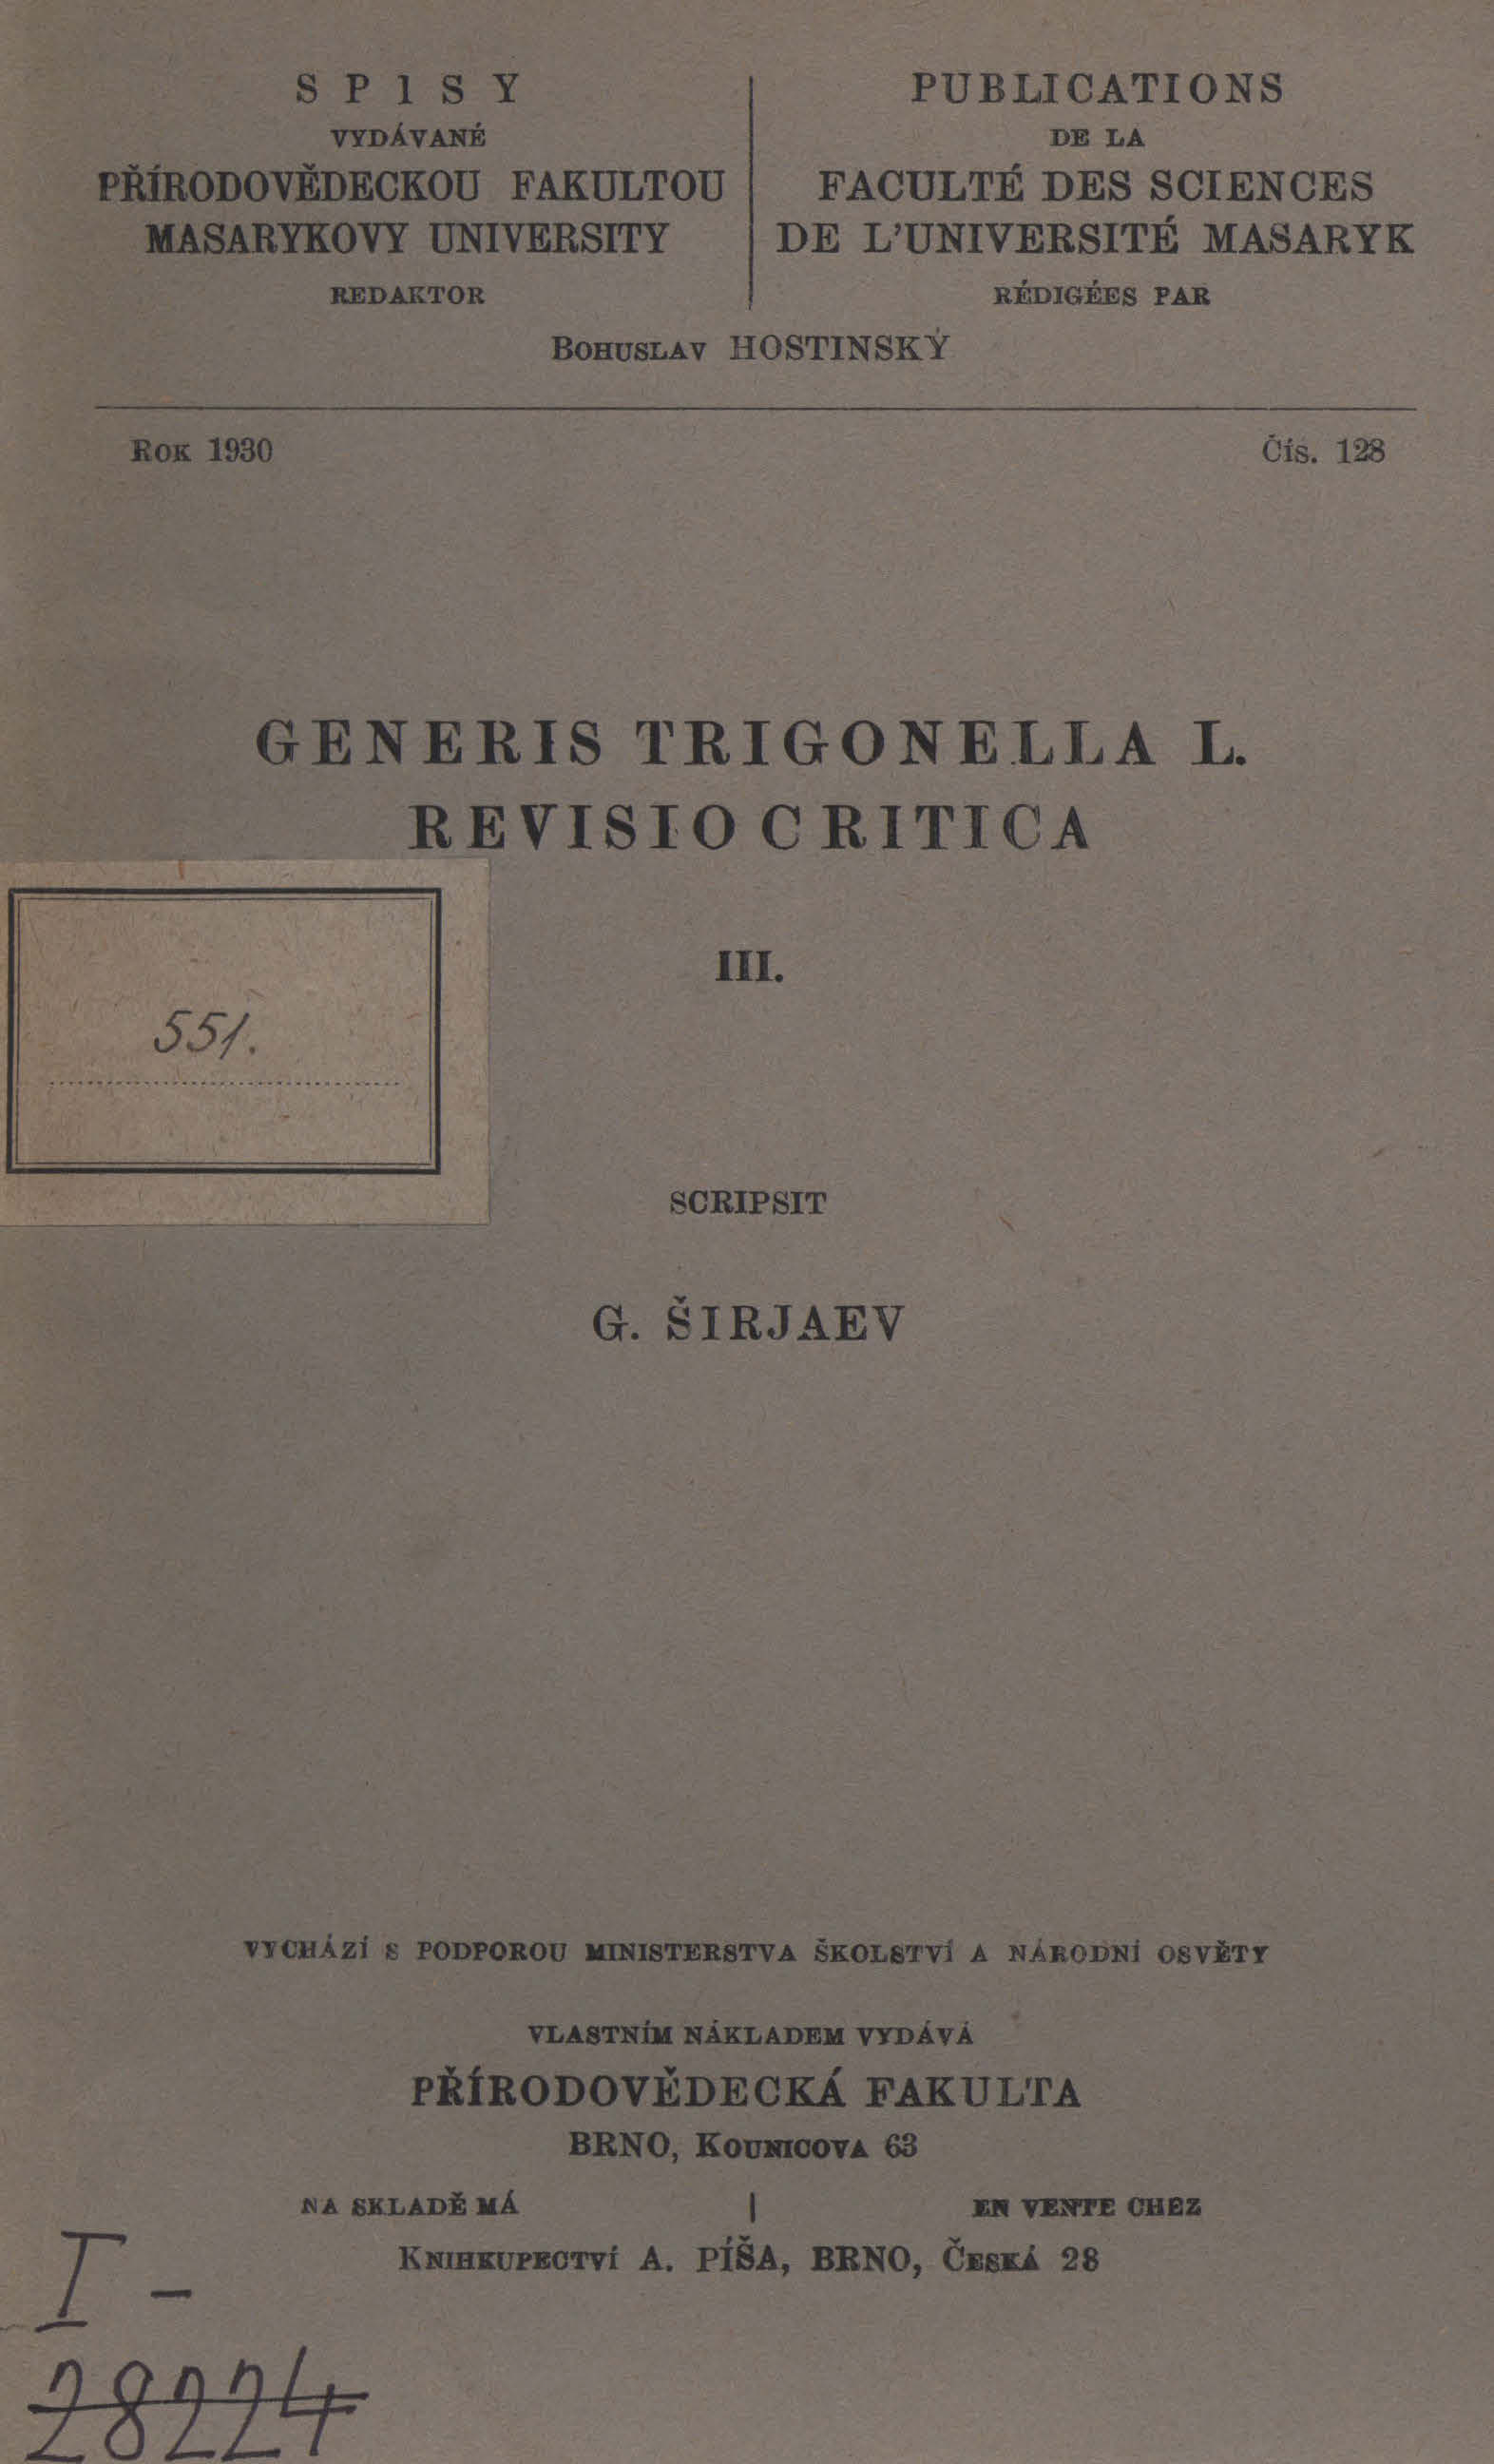 Obálka pro Generis Trigonella L. revisio critica. III